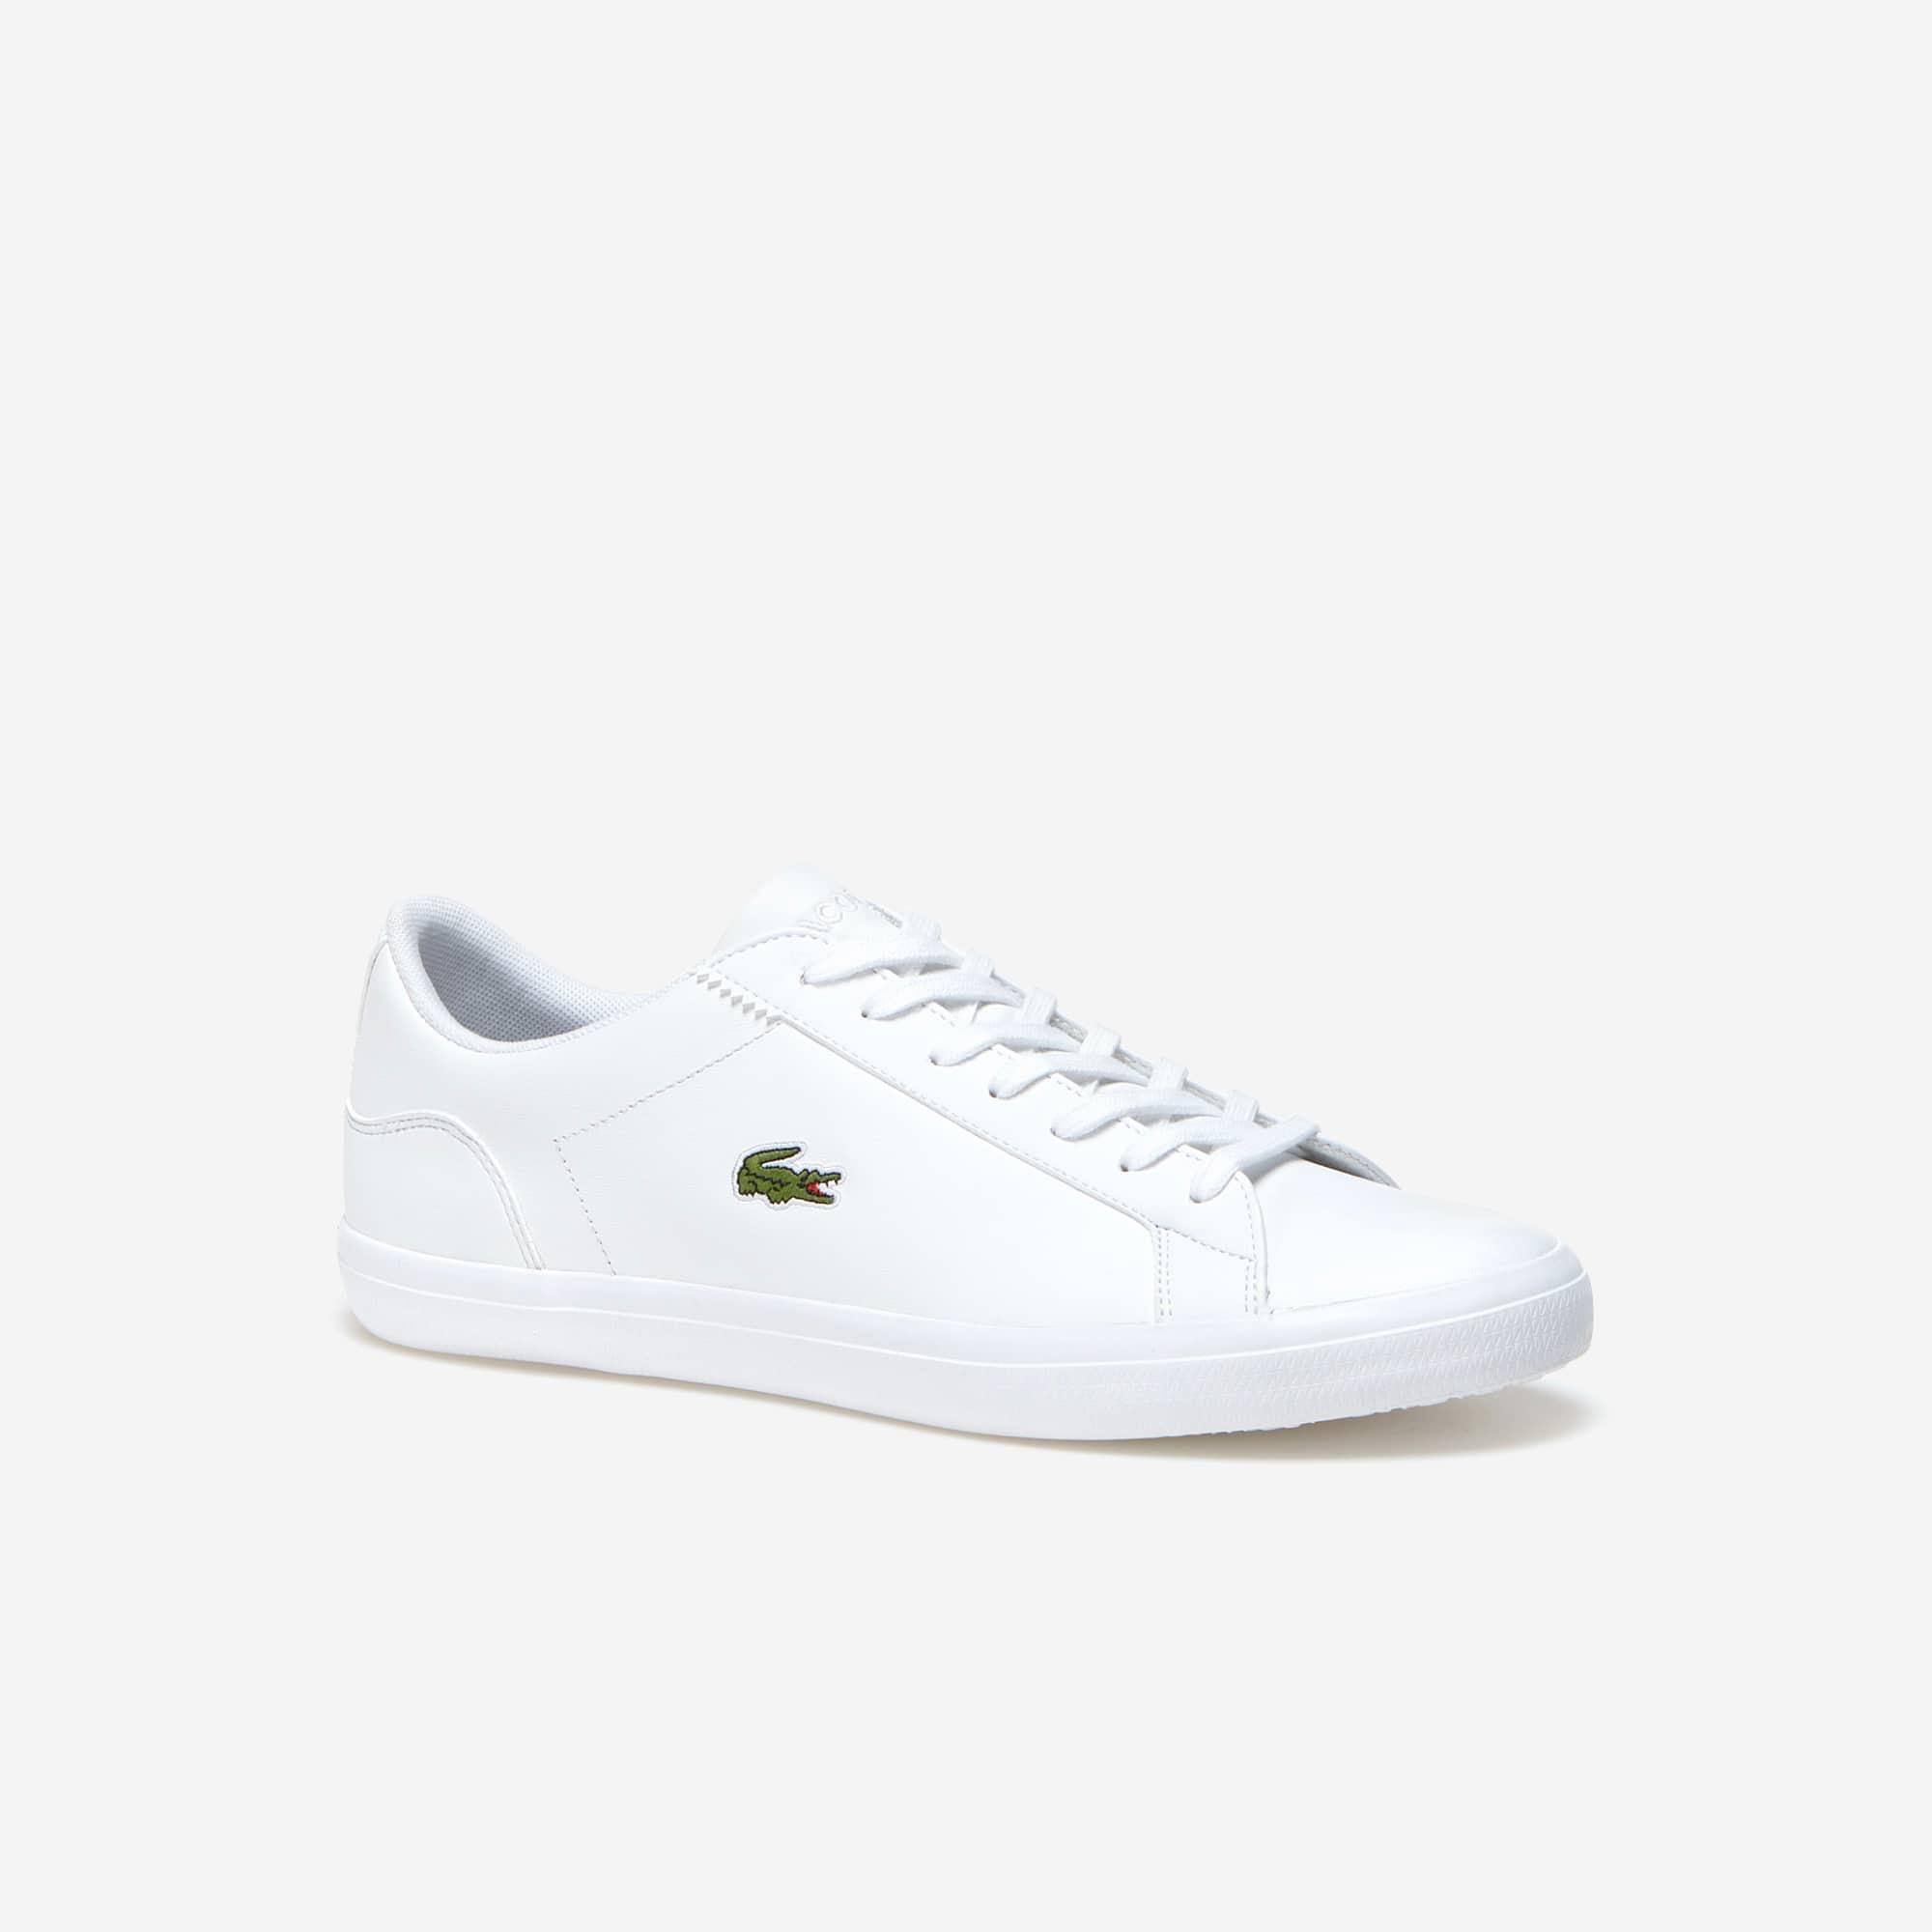 Lacoste Lerond Herren Sneaker Wei/ß